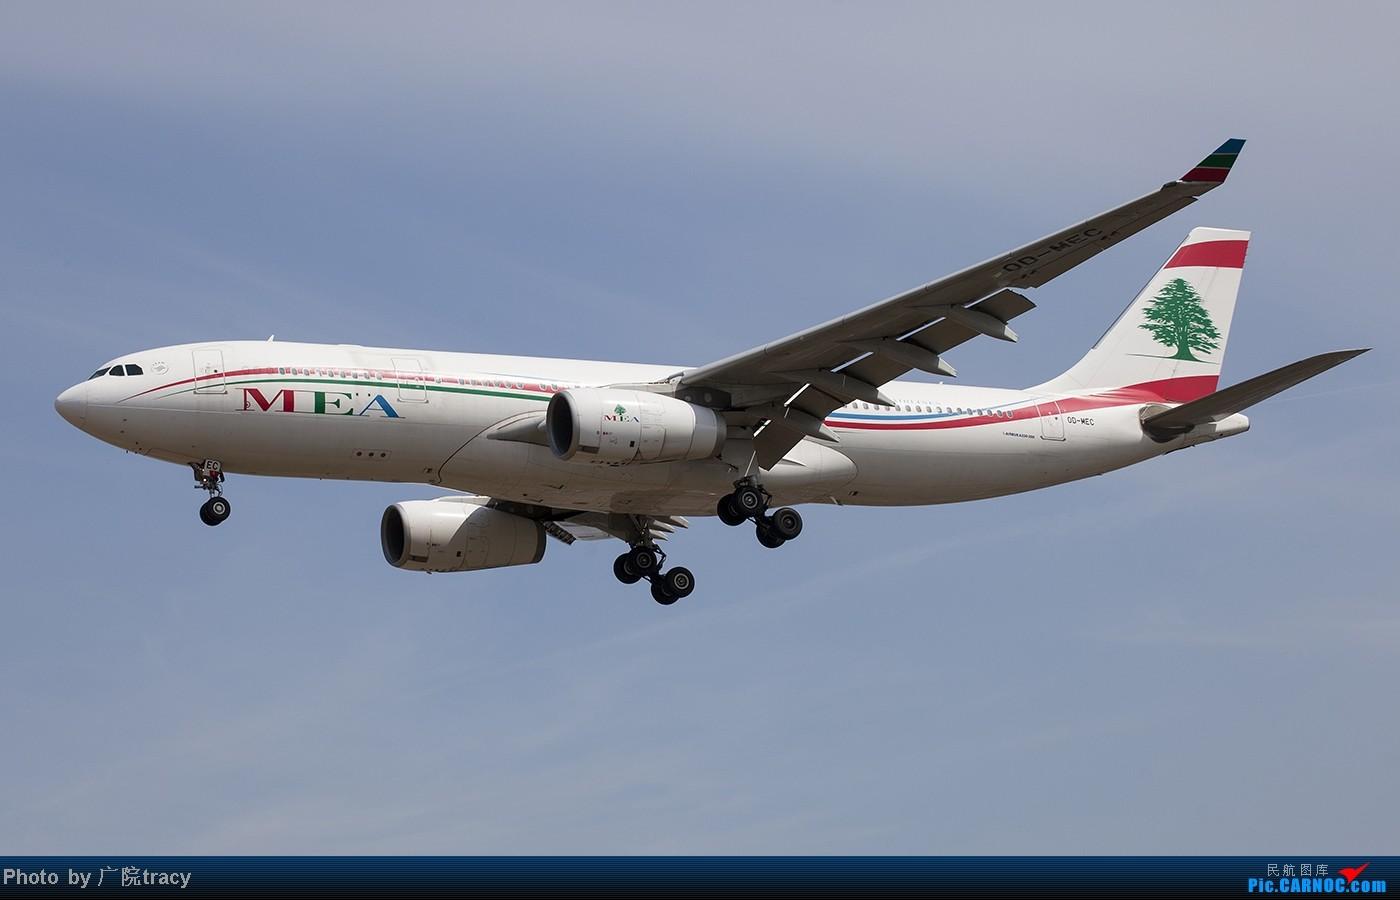 Re:[原创]★ ★ ★ ★ ★中东的航空公司在伦敦希斯罗国际机场  ★ ★ ★ ★ ★ AIRBUS A330-200 OD-MEC 英国伦敦希思罗机场